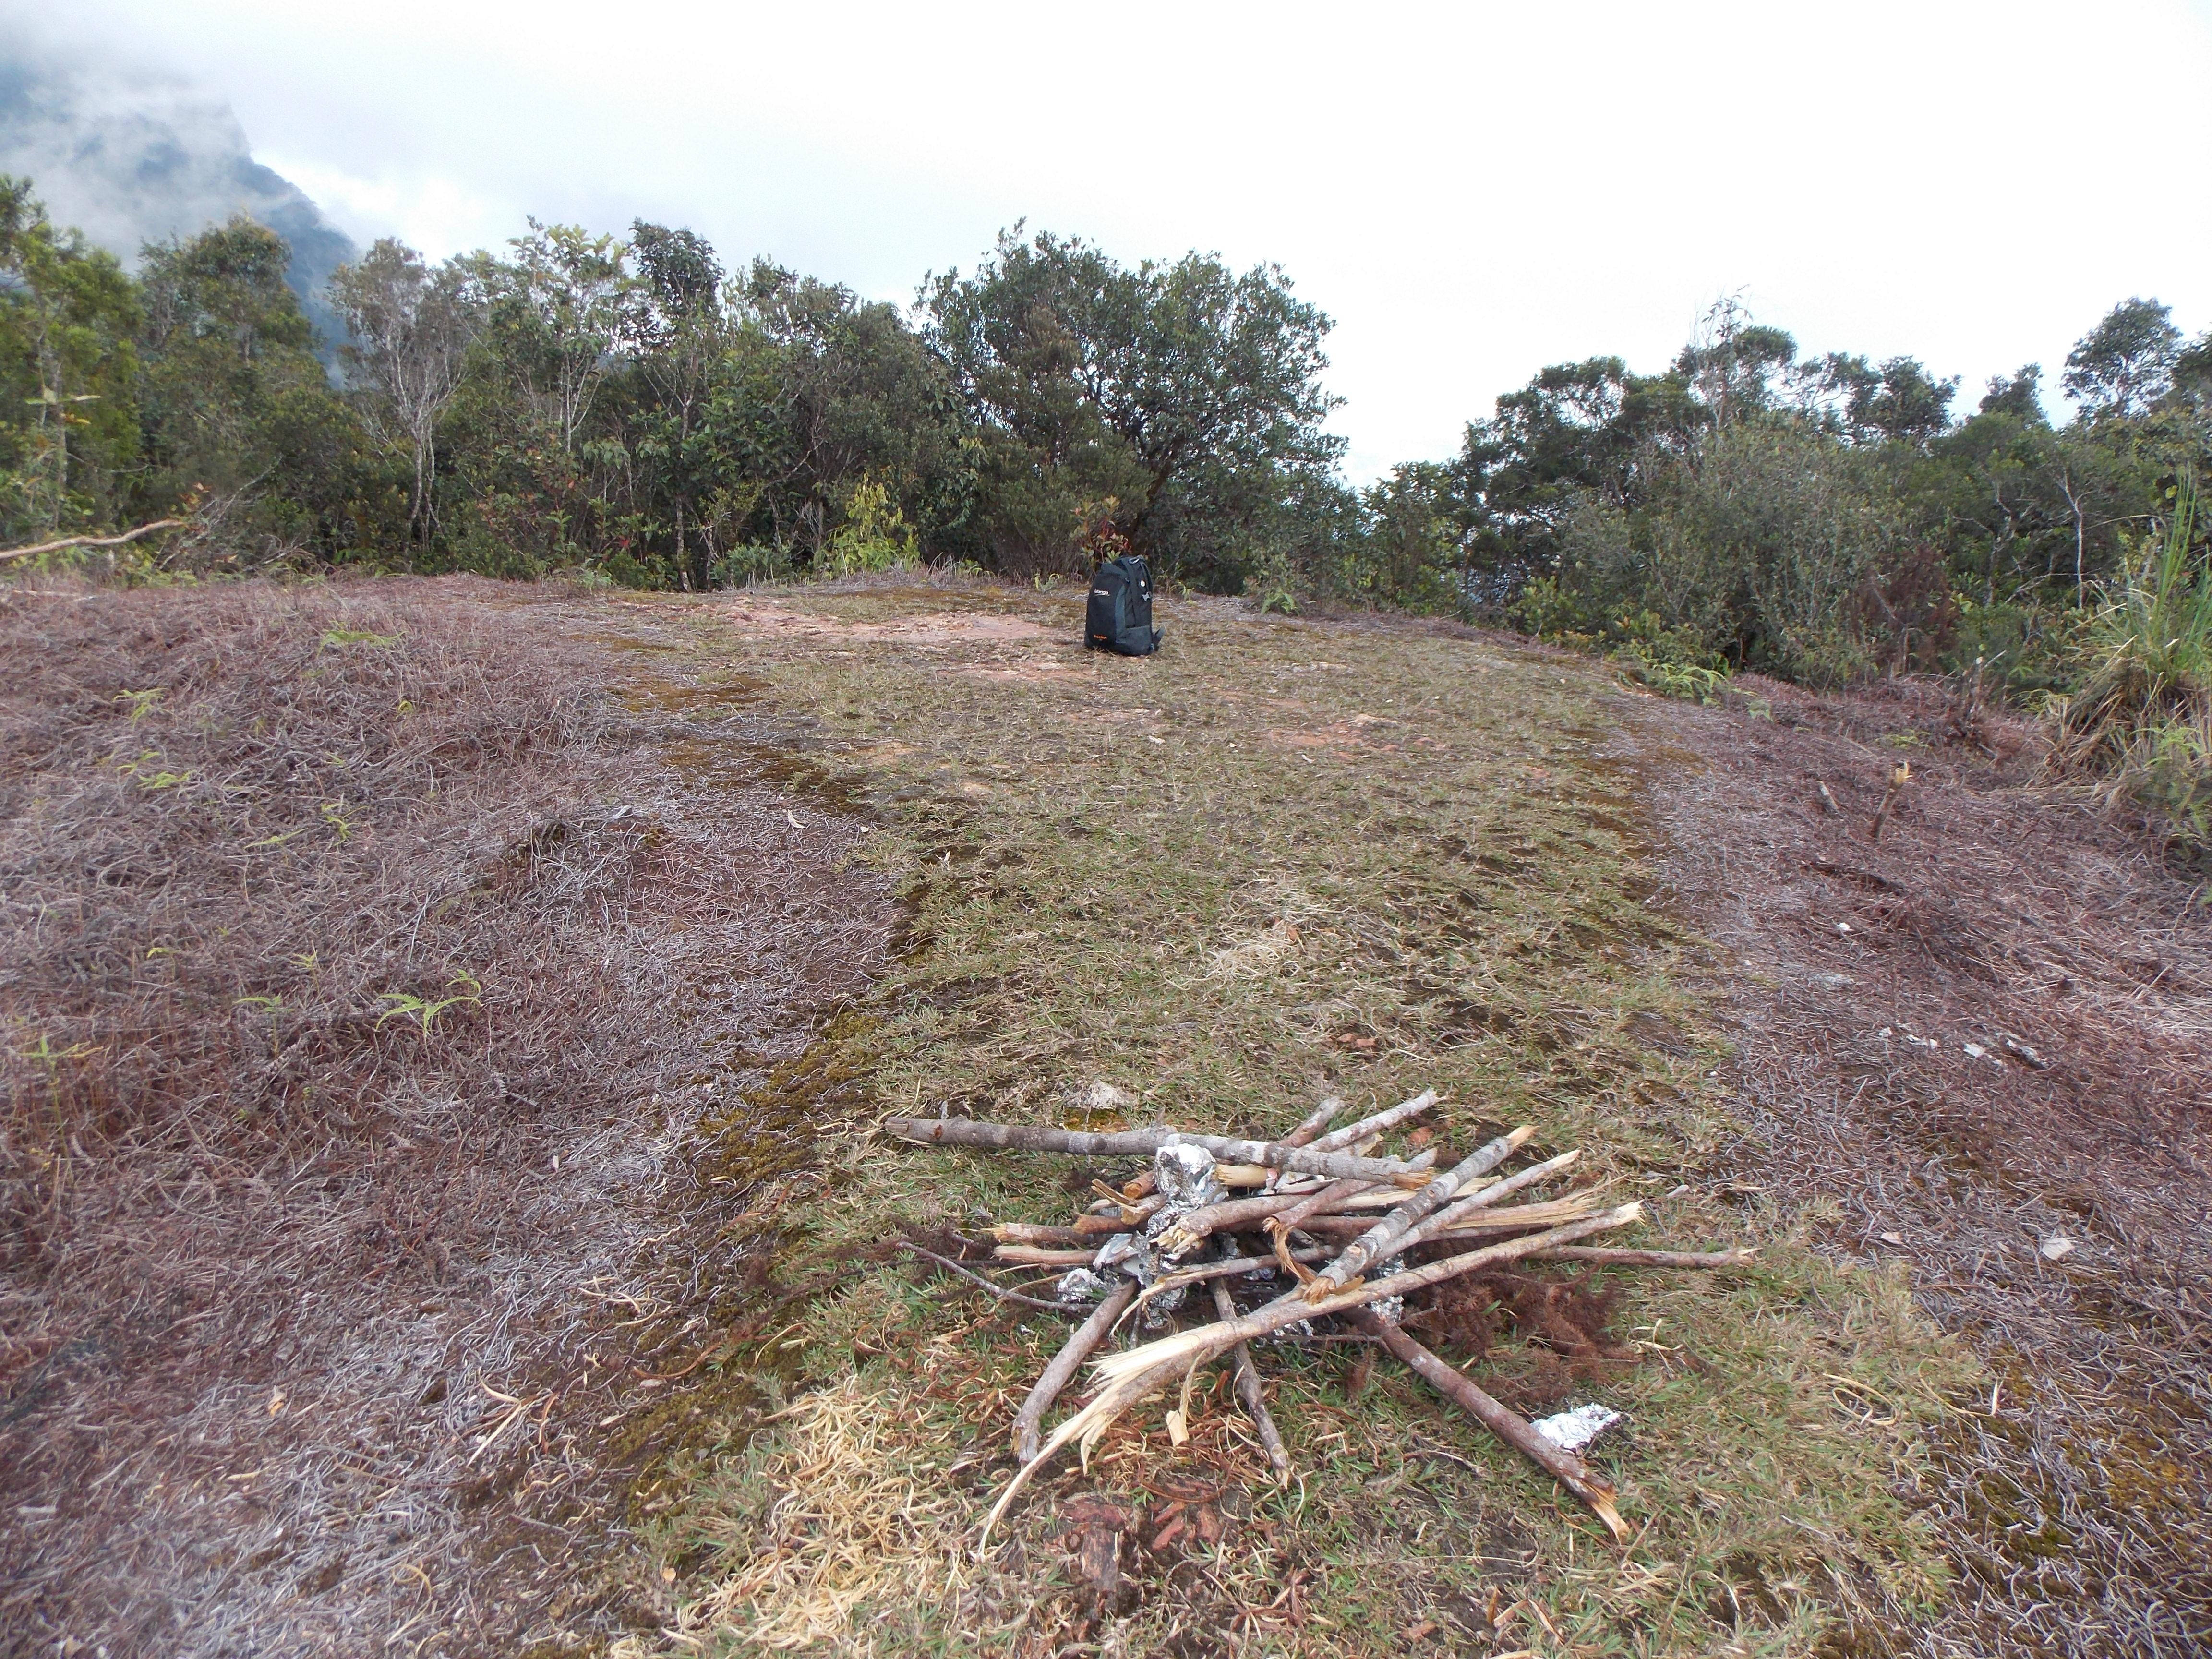 092 The helipad area beyond Camp 4